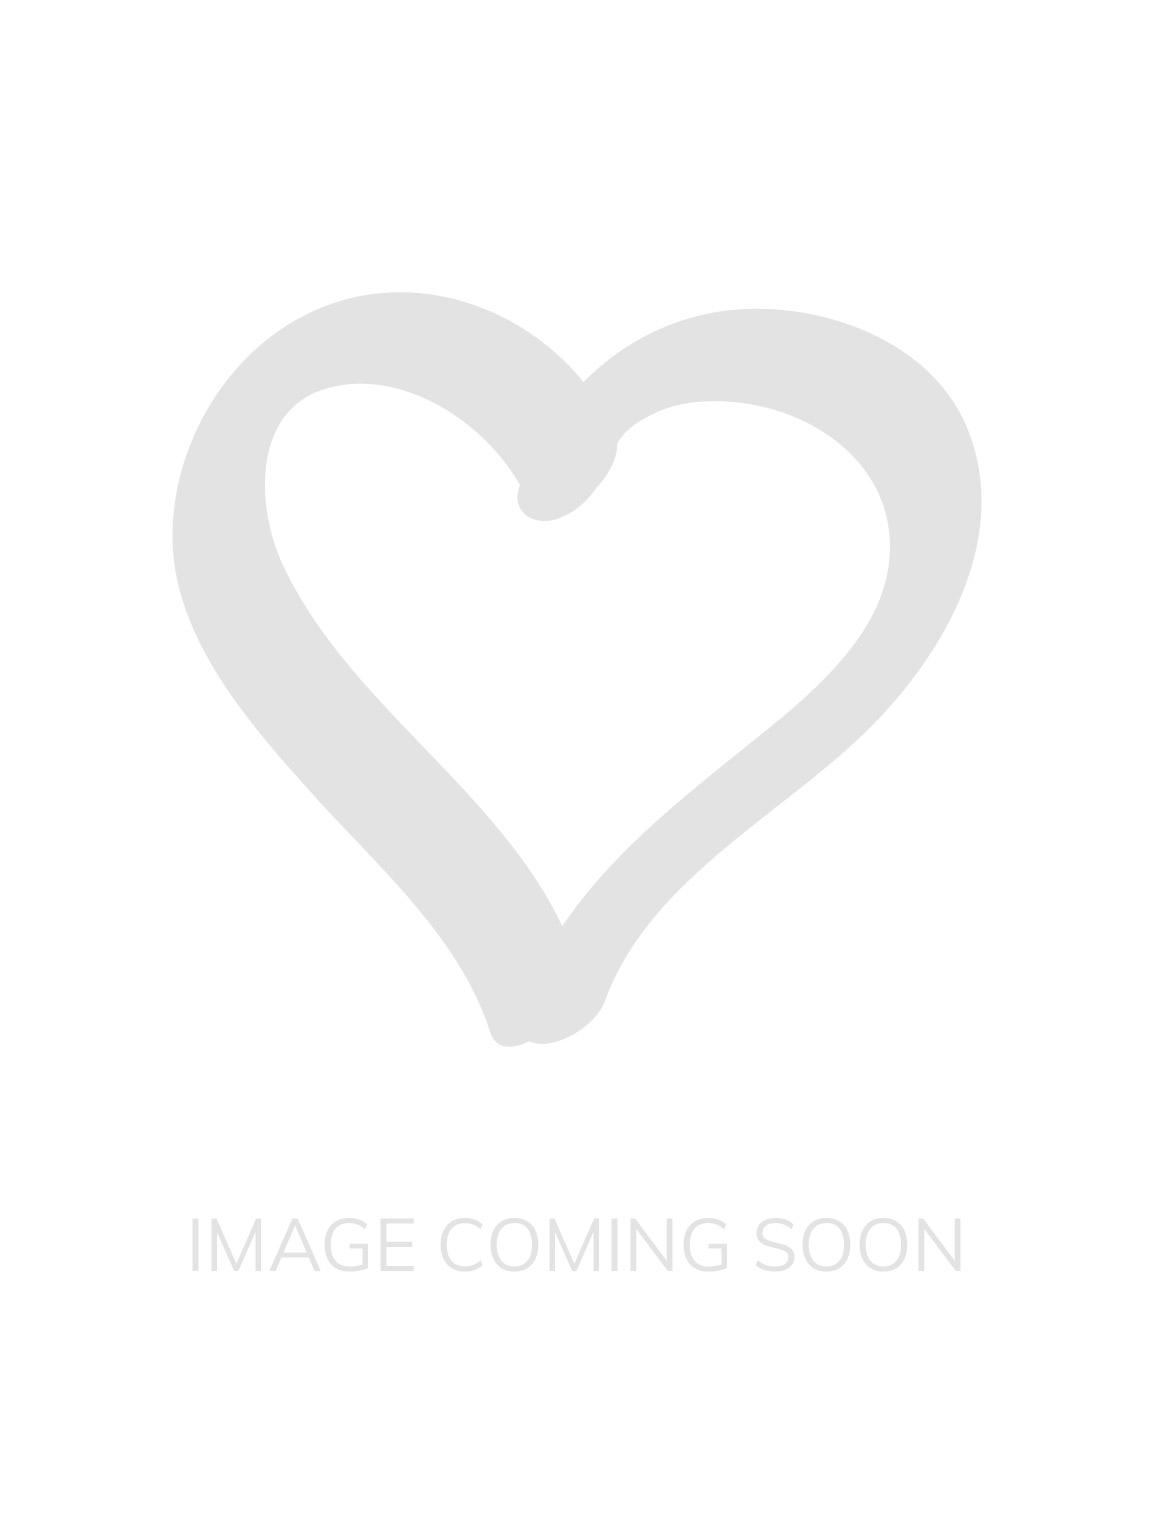 ad3aa1c890029 Freya Soiree Lace Longline Bralette - Coral